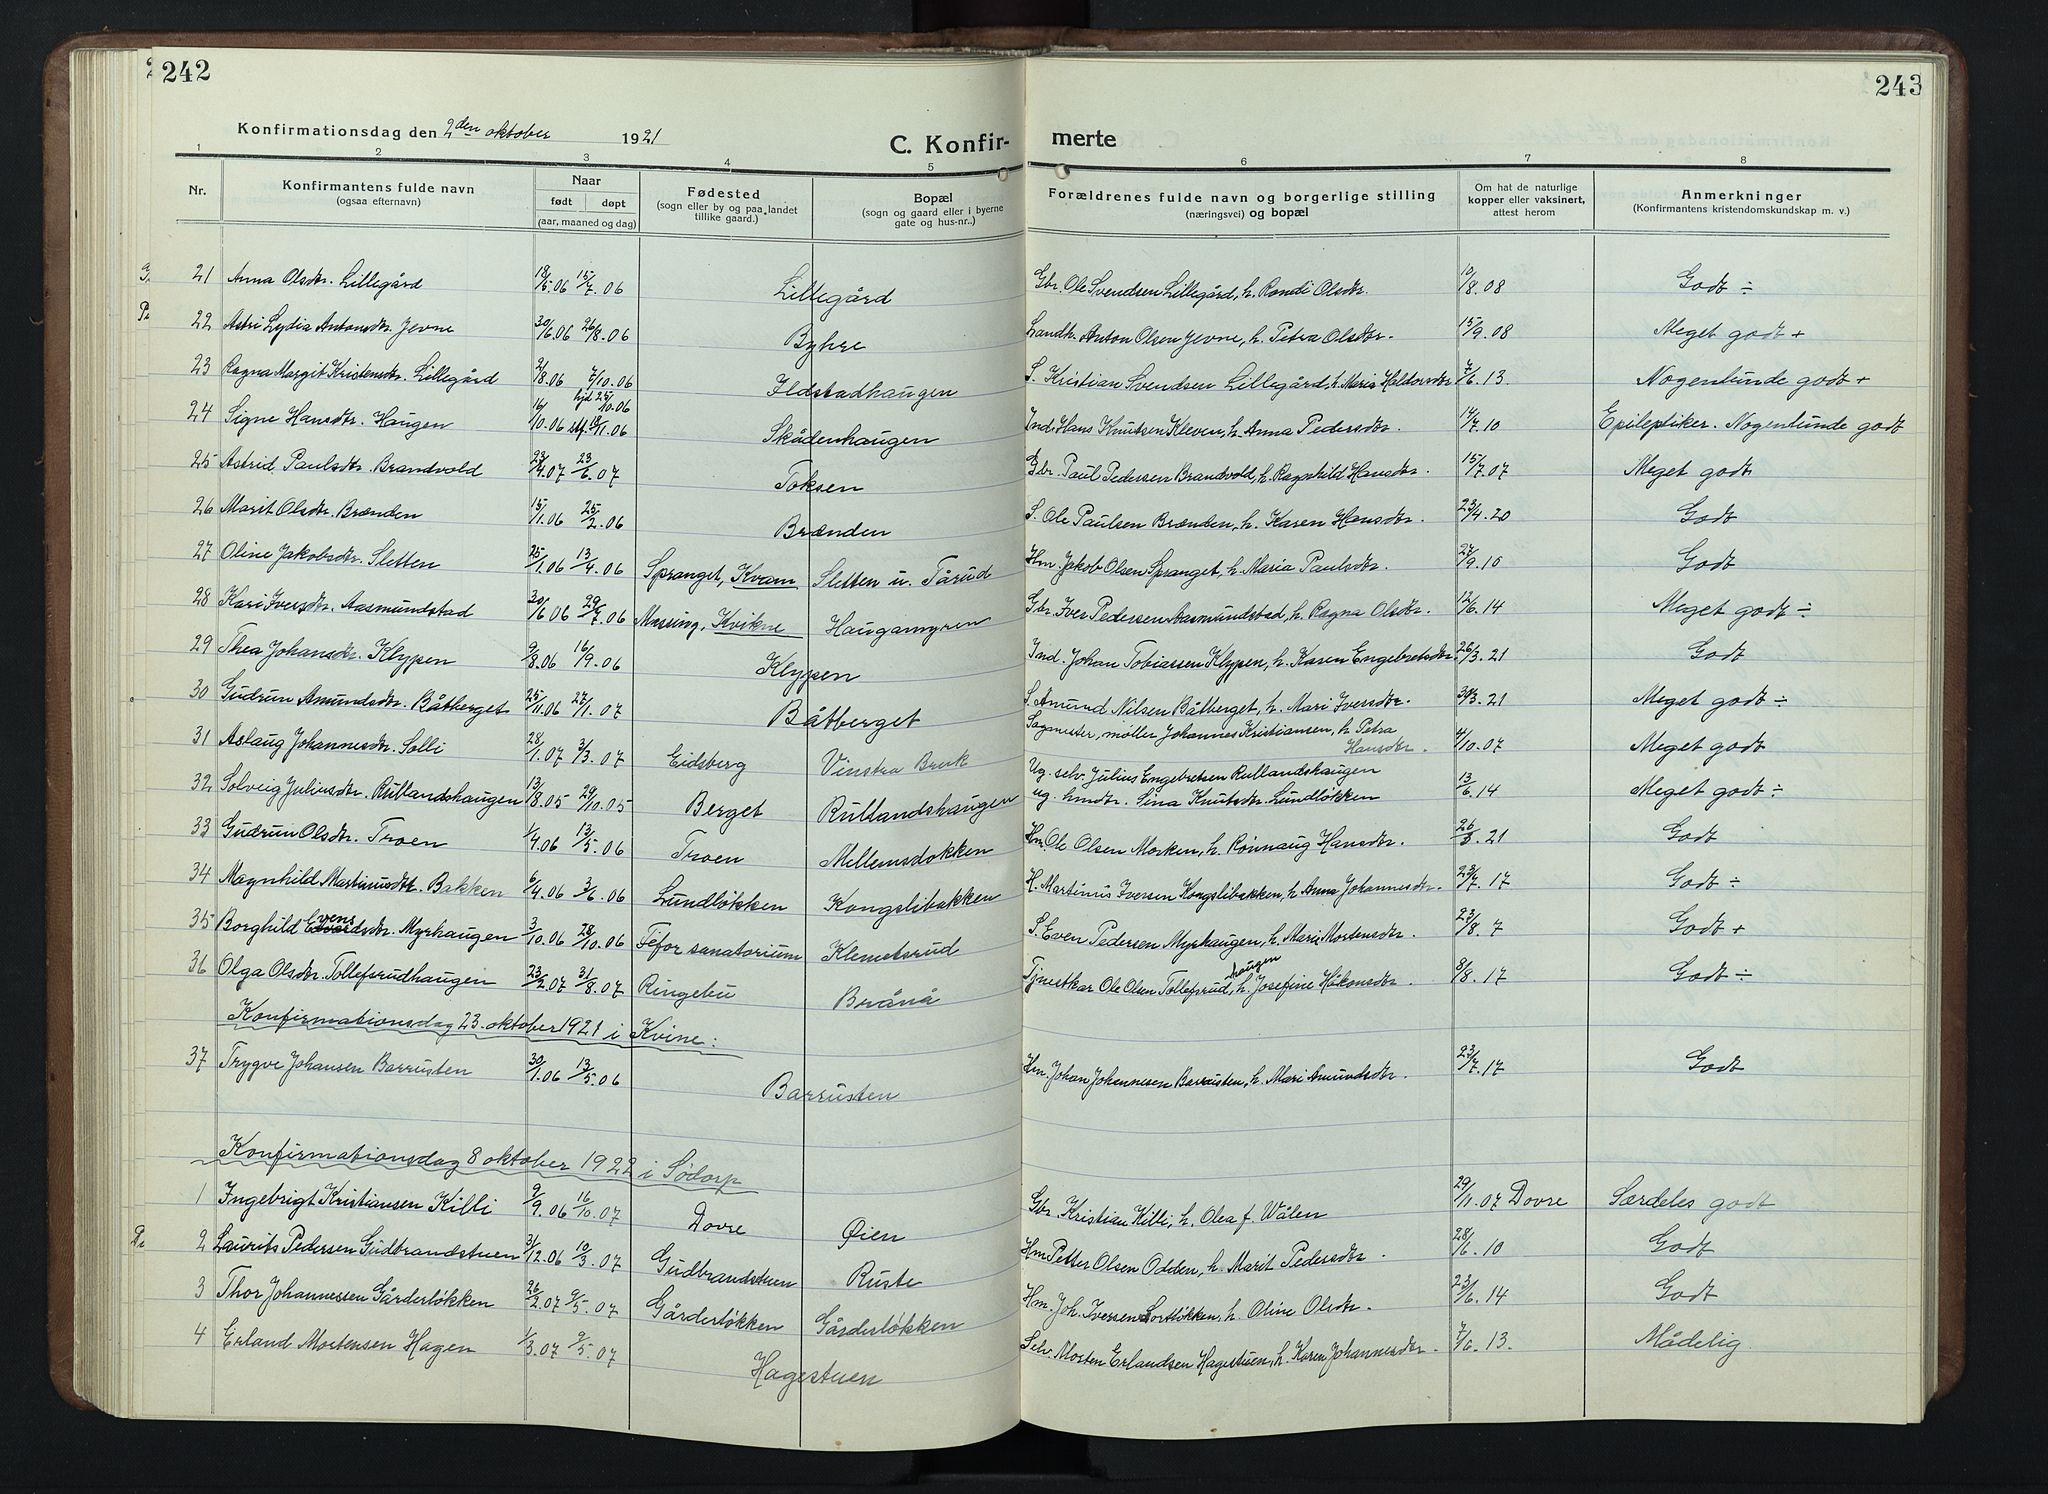 SAH, Nord-Fron prestekontor, Klokkerbok nr. 7, 1915-1946, s. 242-243